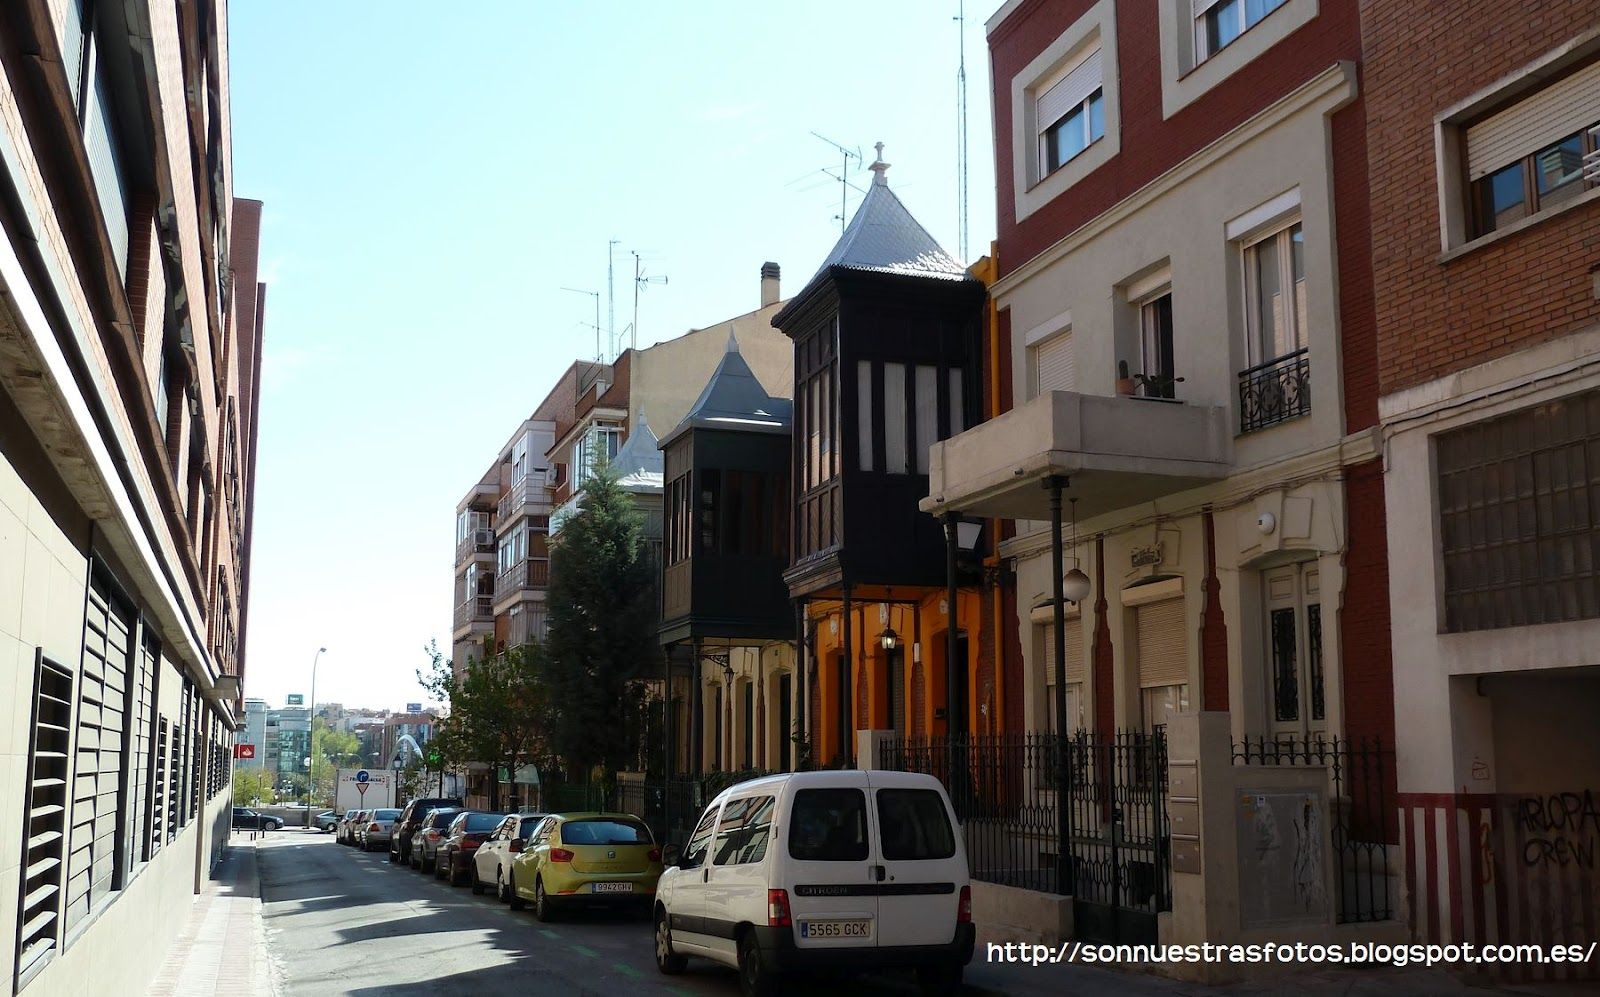 Nuestras fotos el madrid moderno for Madrid moderno